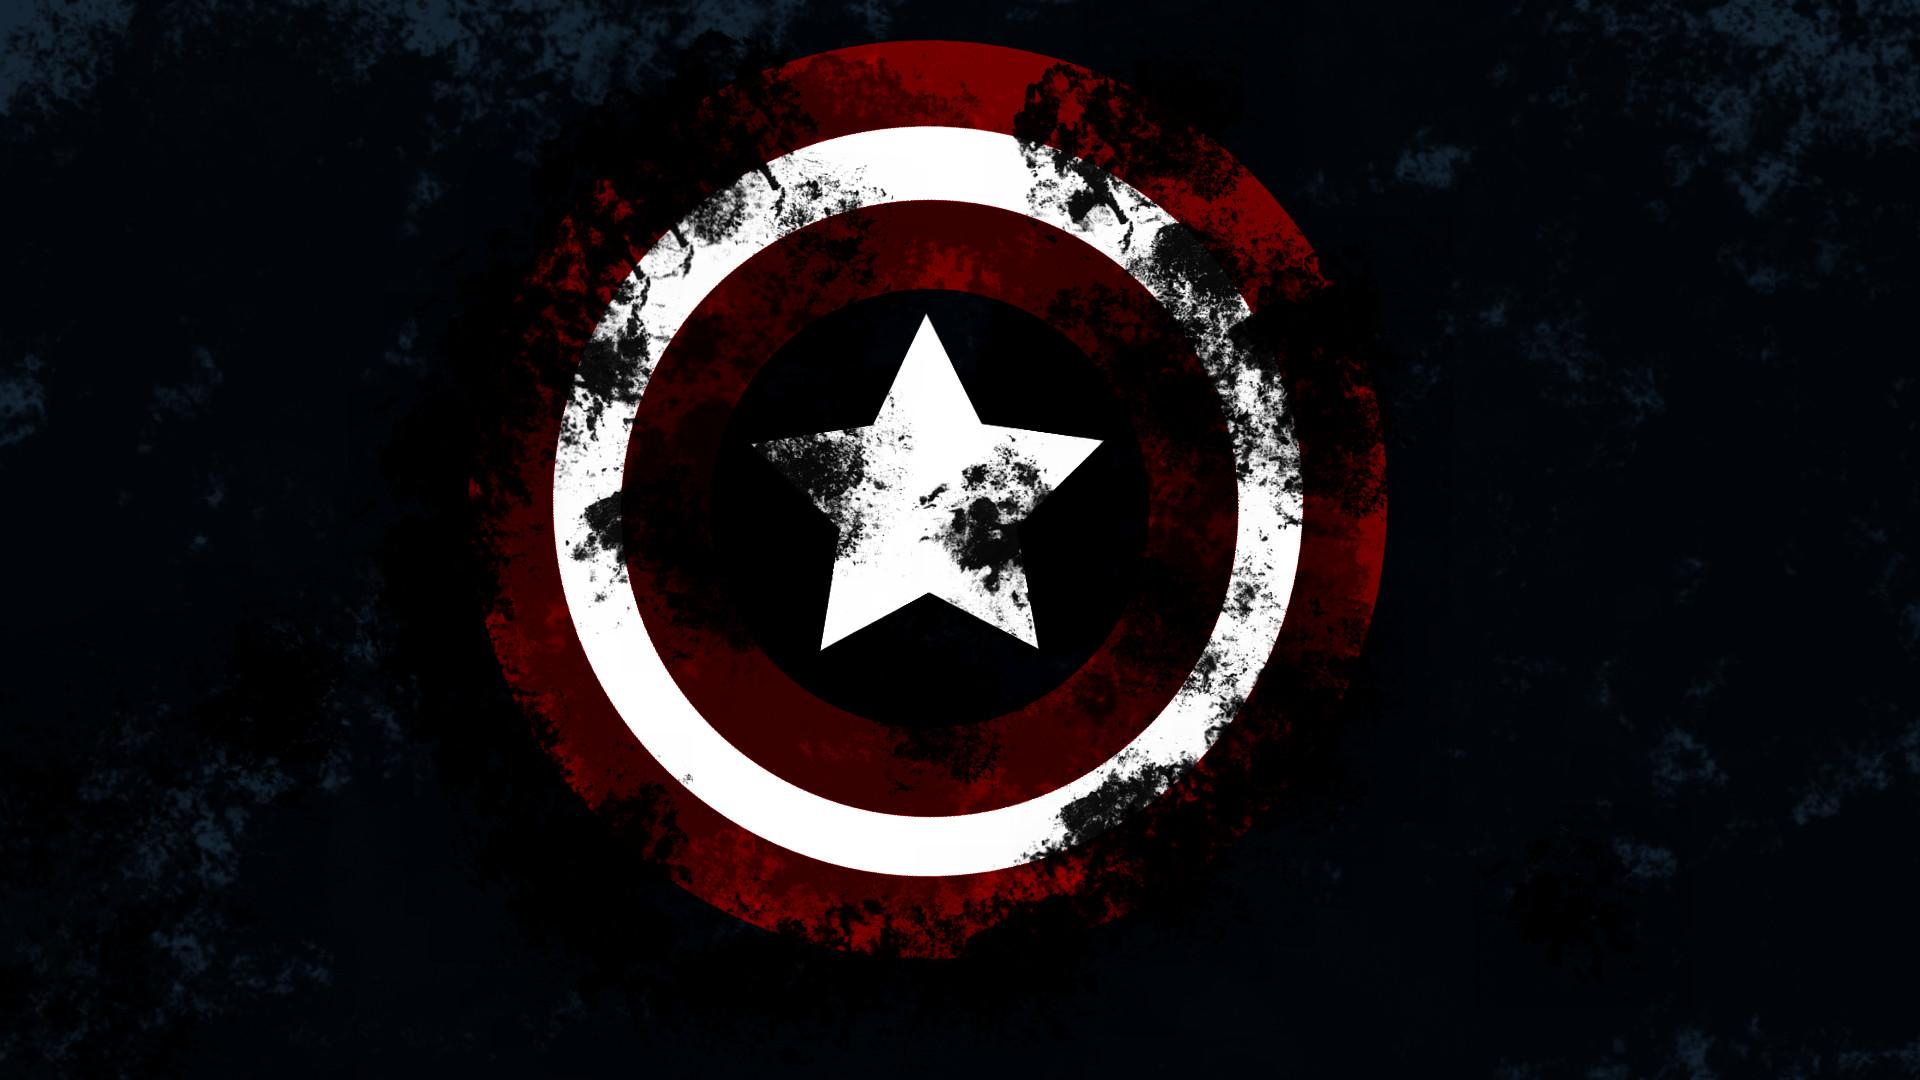 … captain america shield wallpapers wallpaper cave …